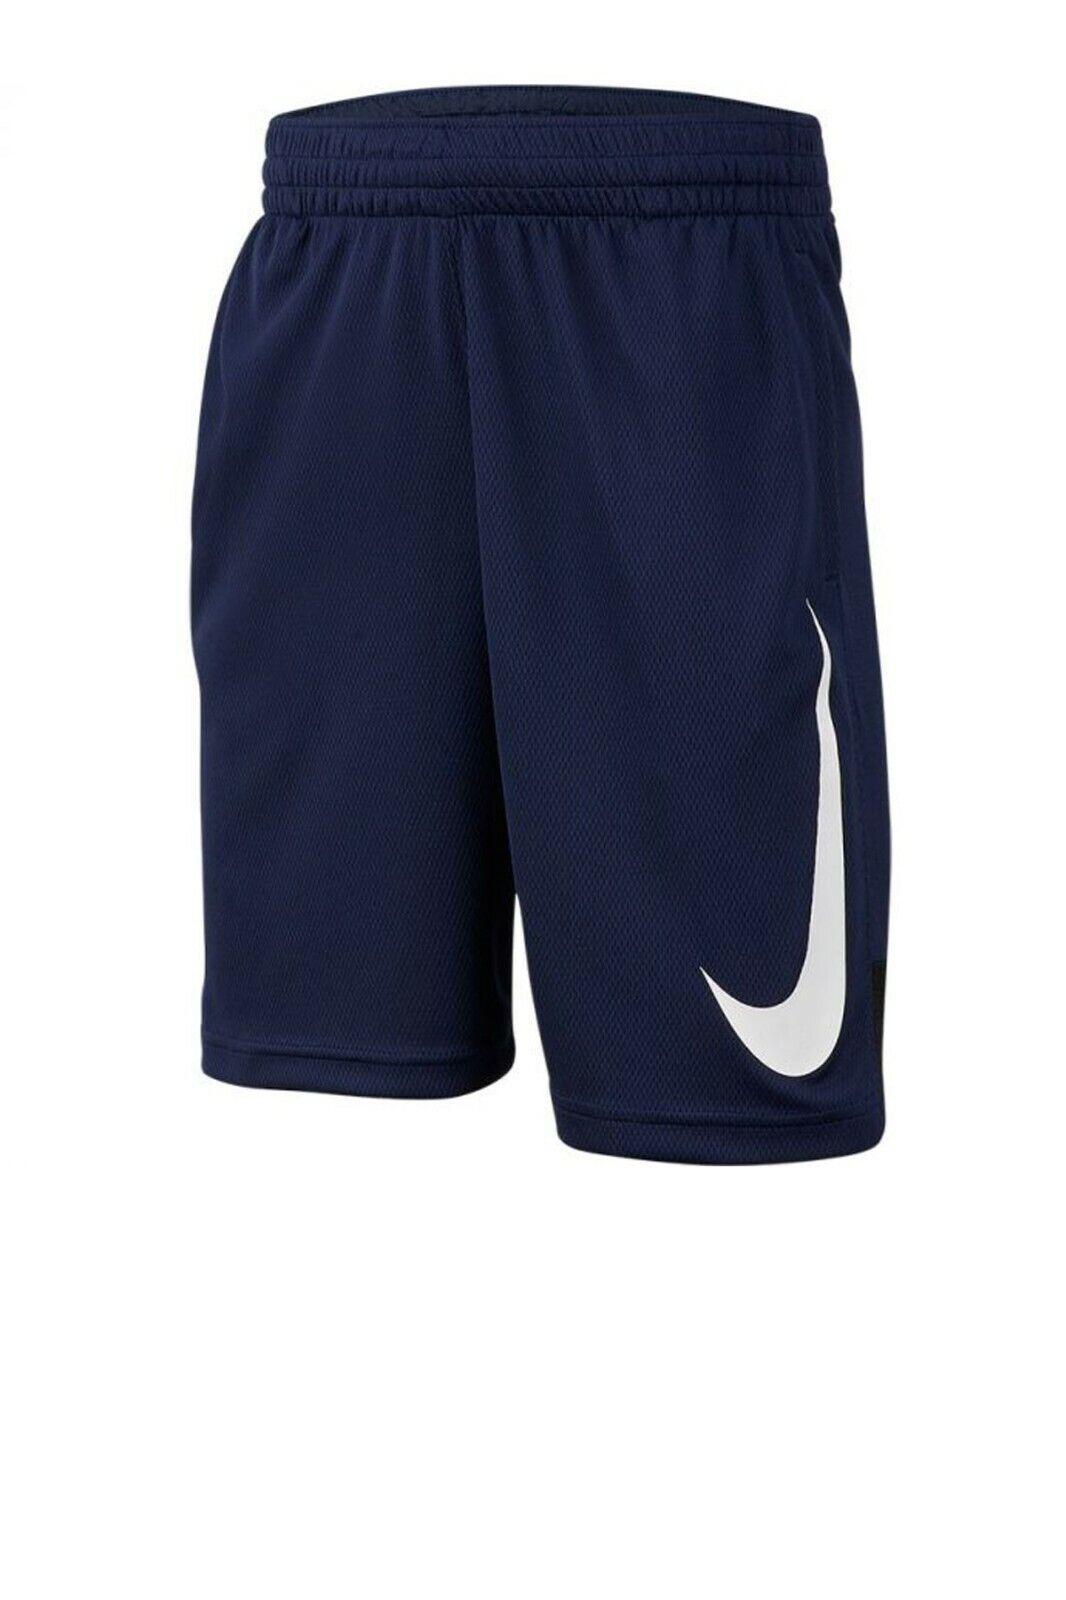 Nike Dry Basketball Shorts Boys Kinder Basketballhose 892362 410